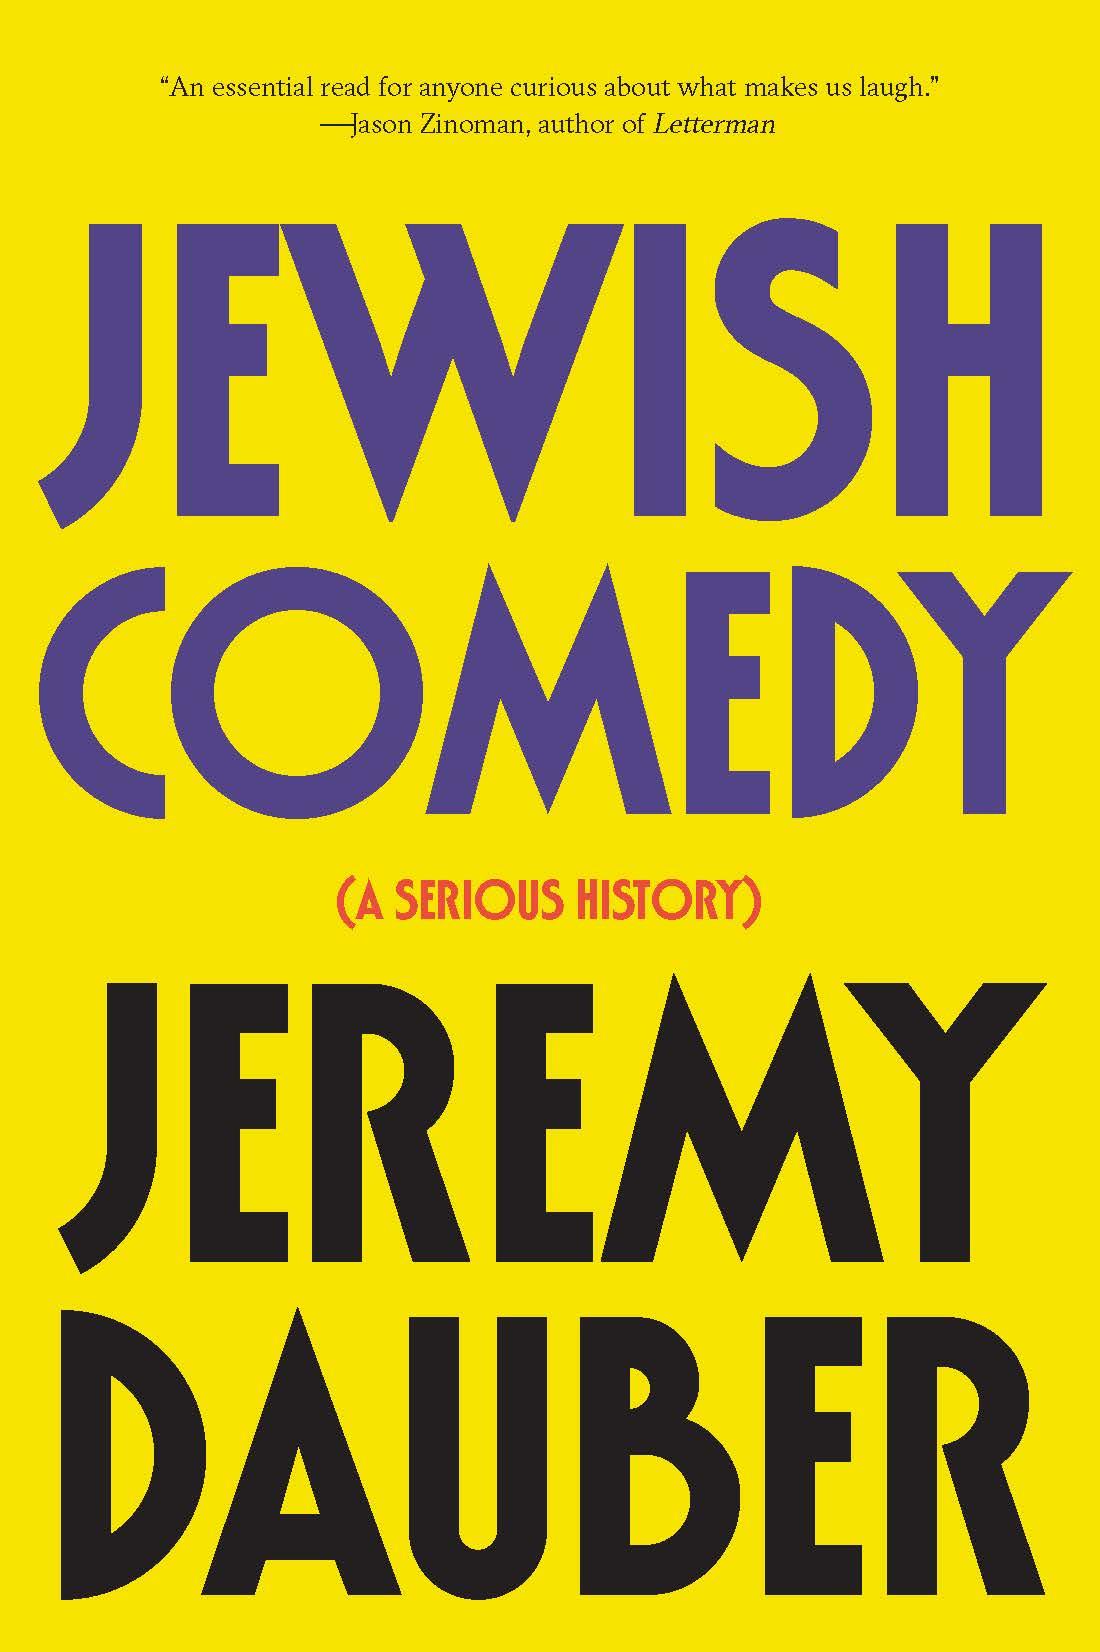 Jewish Comedy_978-0-393-35629-8 (1).jpg